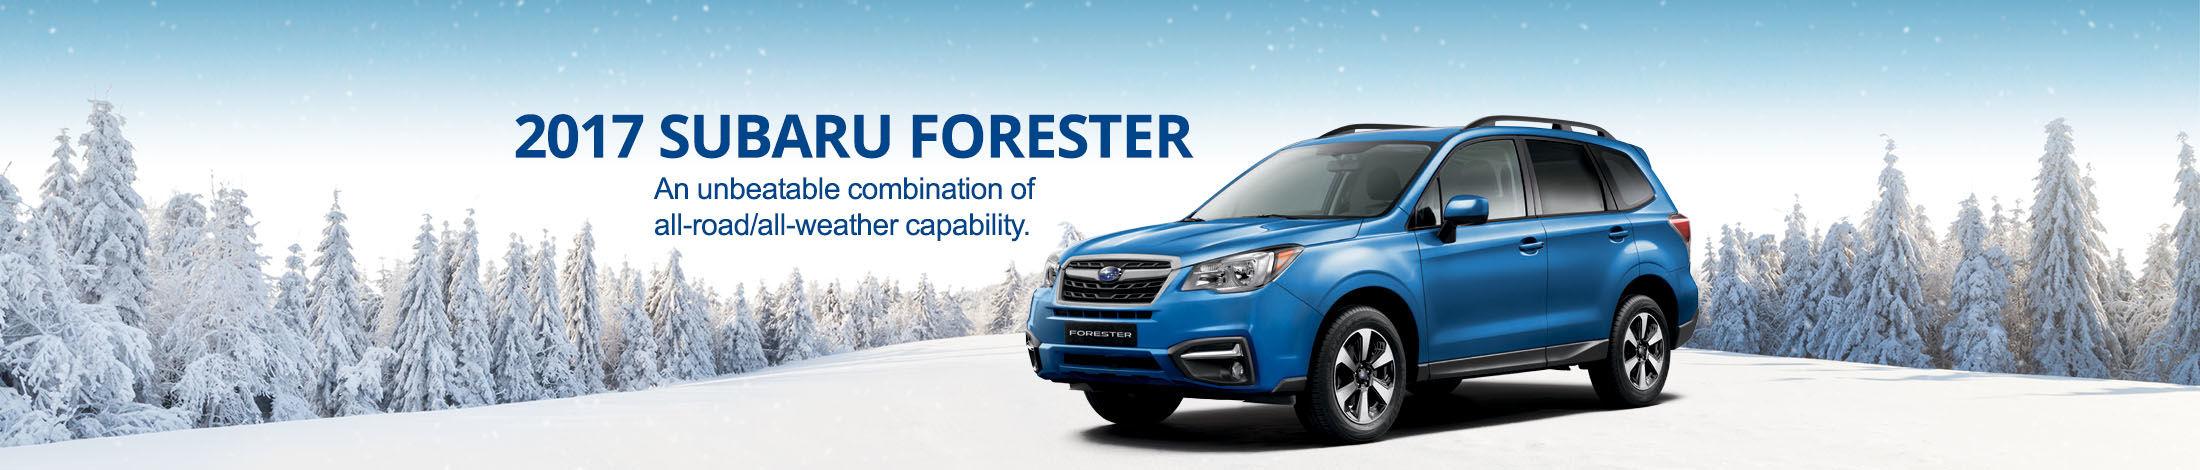 Header Subaru Forester 2017 Hiver